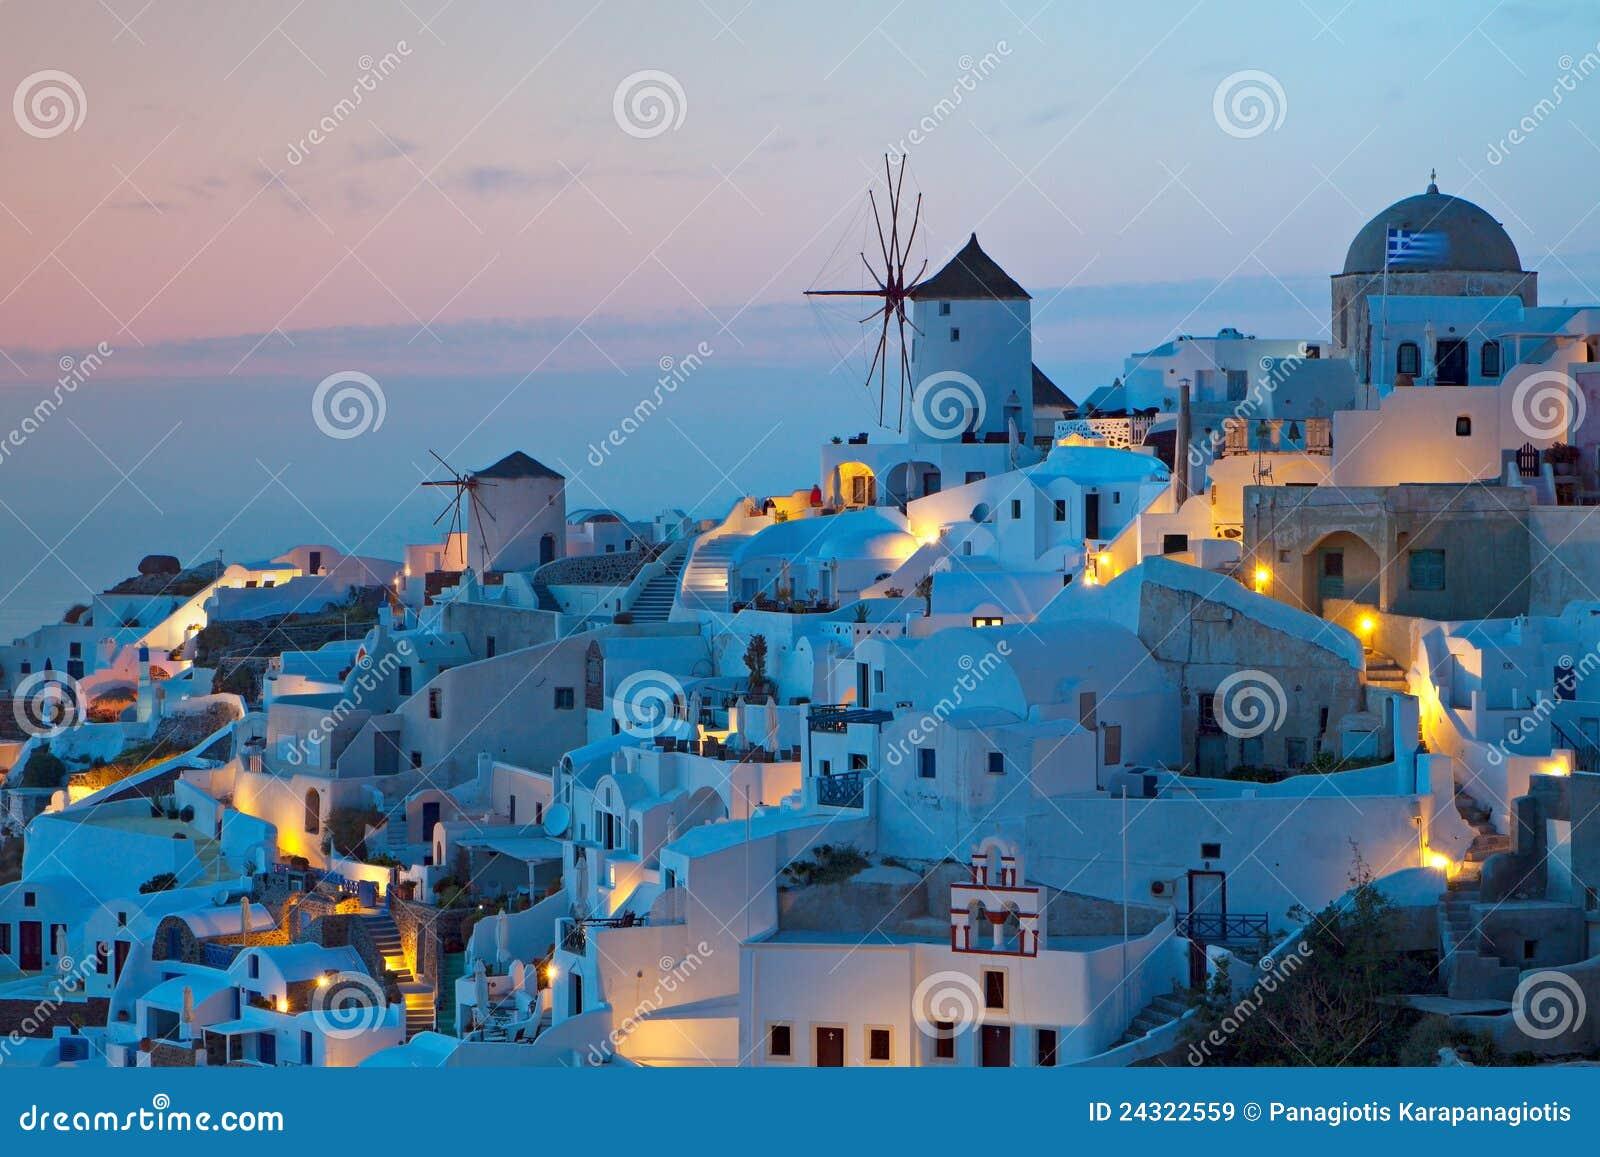 Oia village at Santorini island in Greece